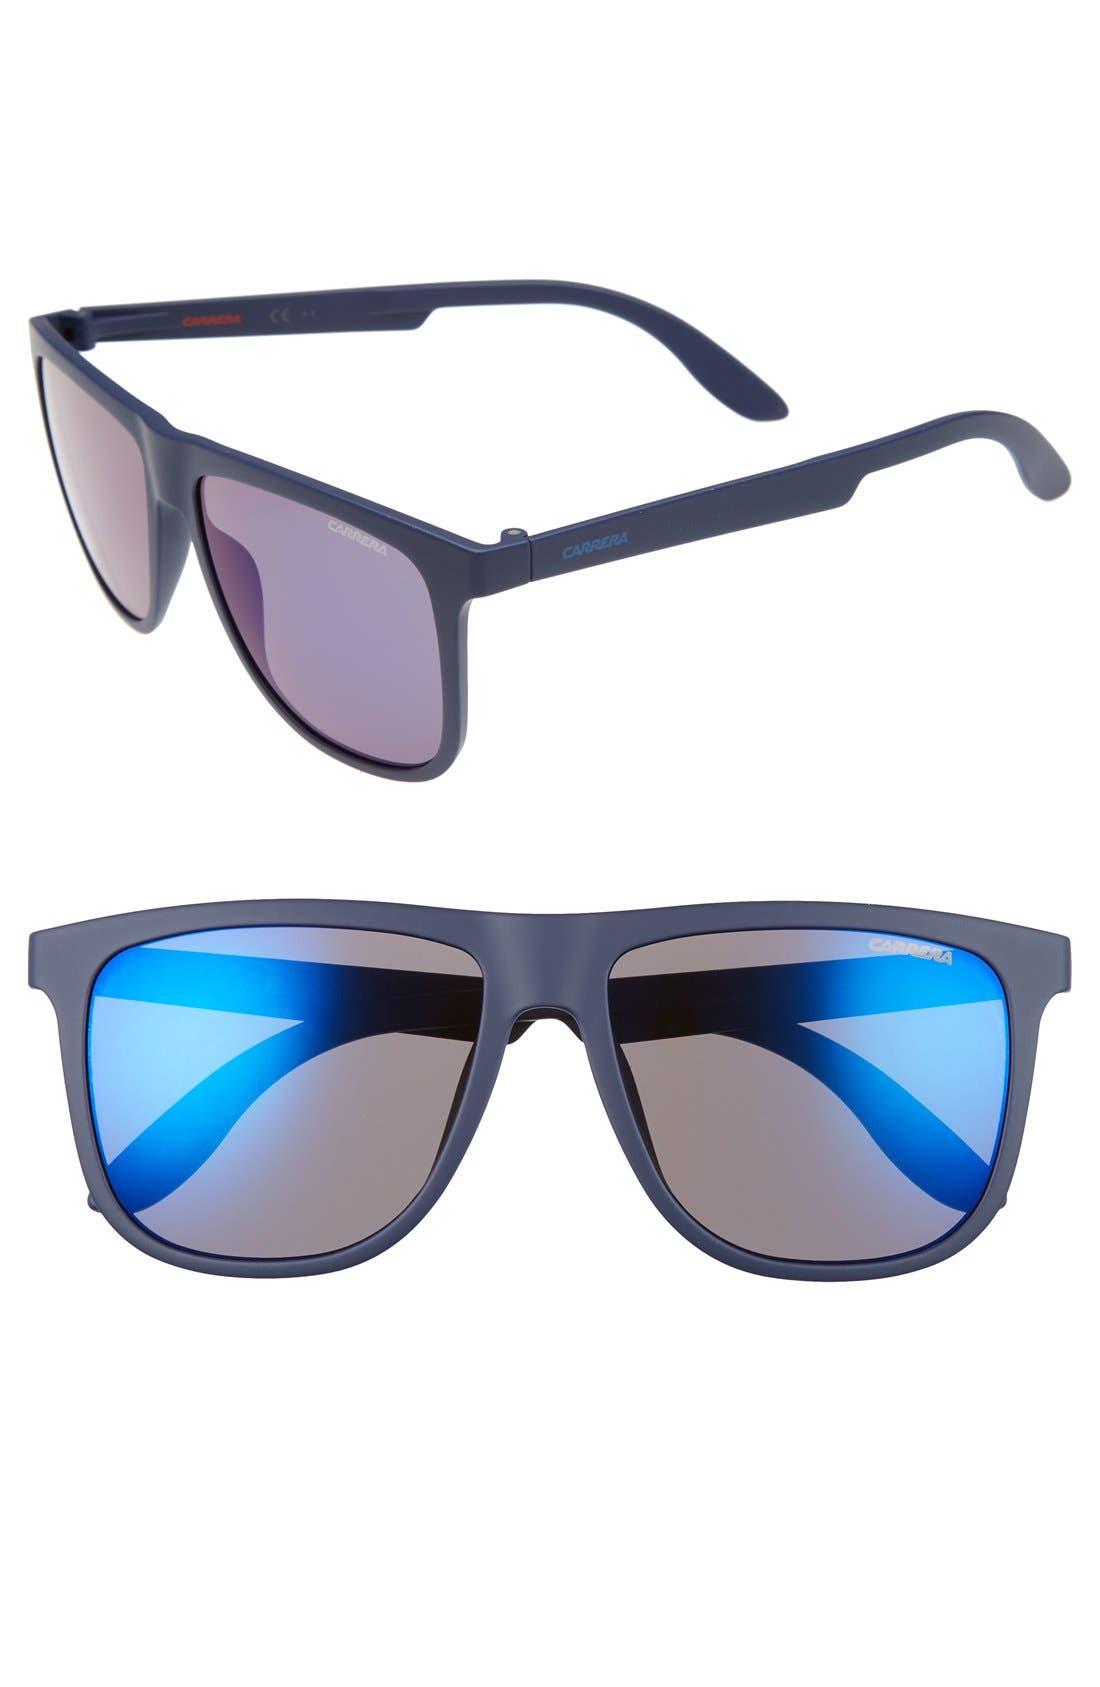 Carrera Eyewear 5003ST 57mm Sunglasses